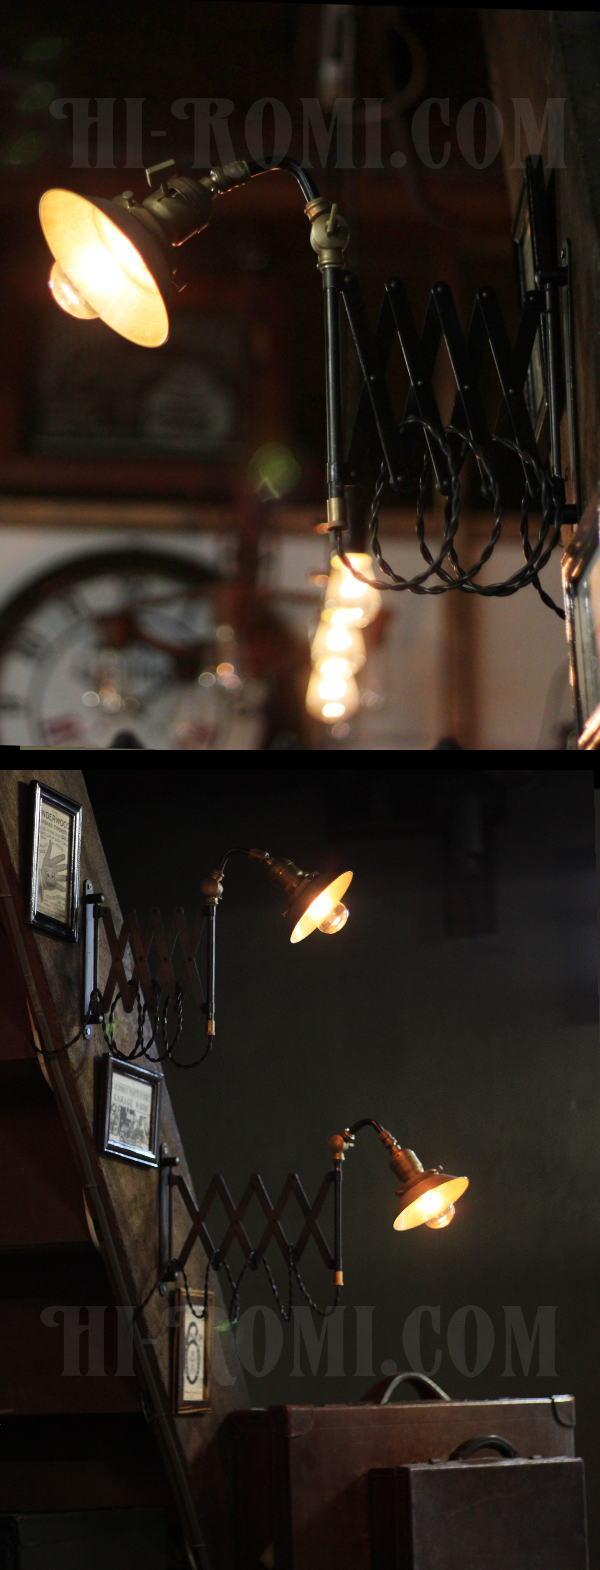 USAヴィンテージ工業系真鍮シェード付角度調整付シザーアーム蛇腹ブラケットランプB/アンティーク照明 アンティーク照明&雑貨 Hi-Romi.com 神戸